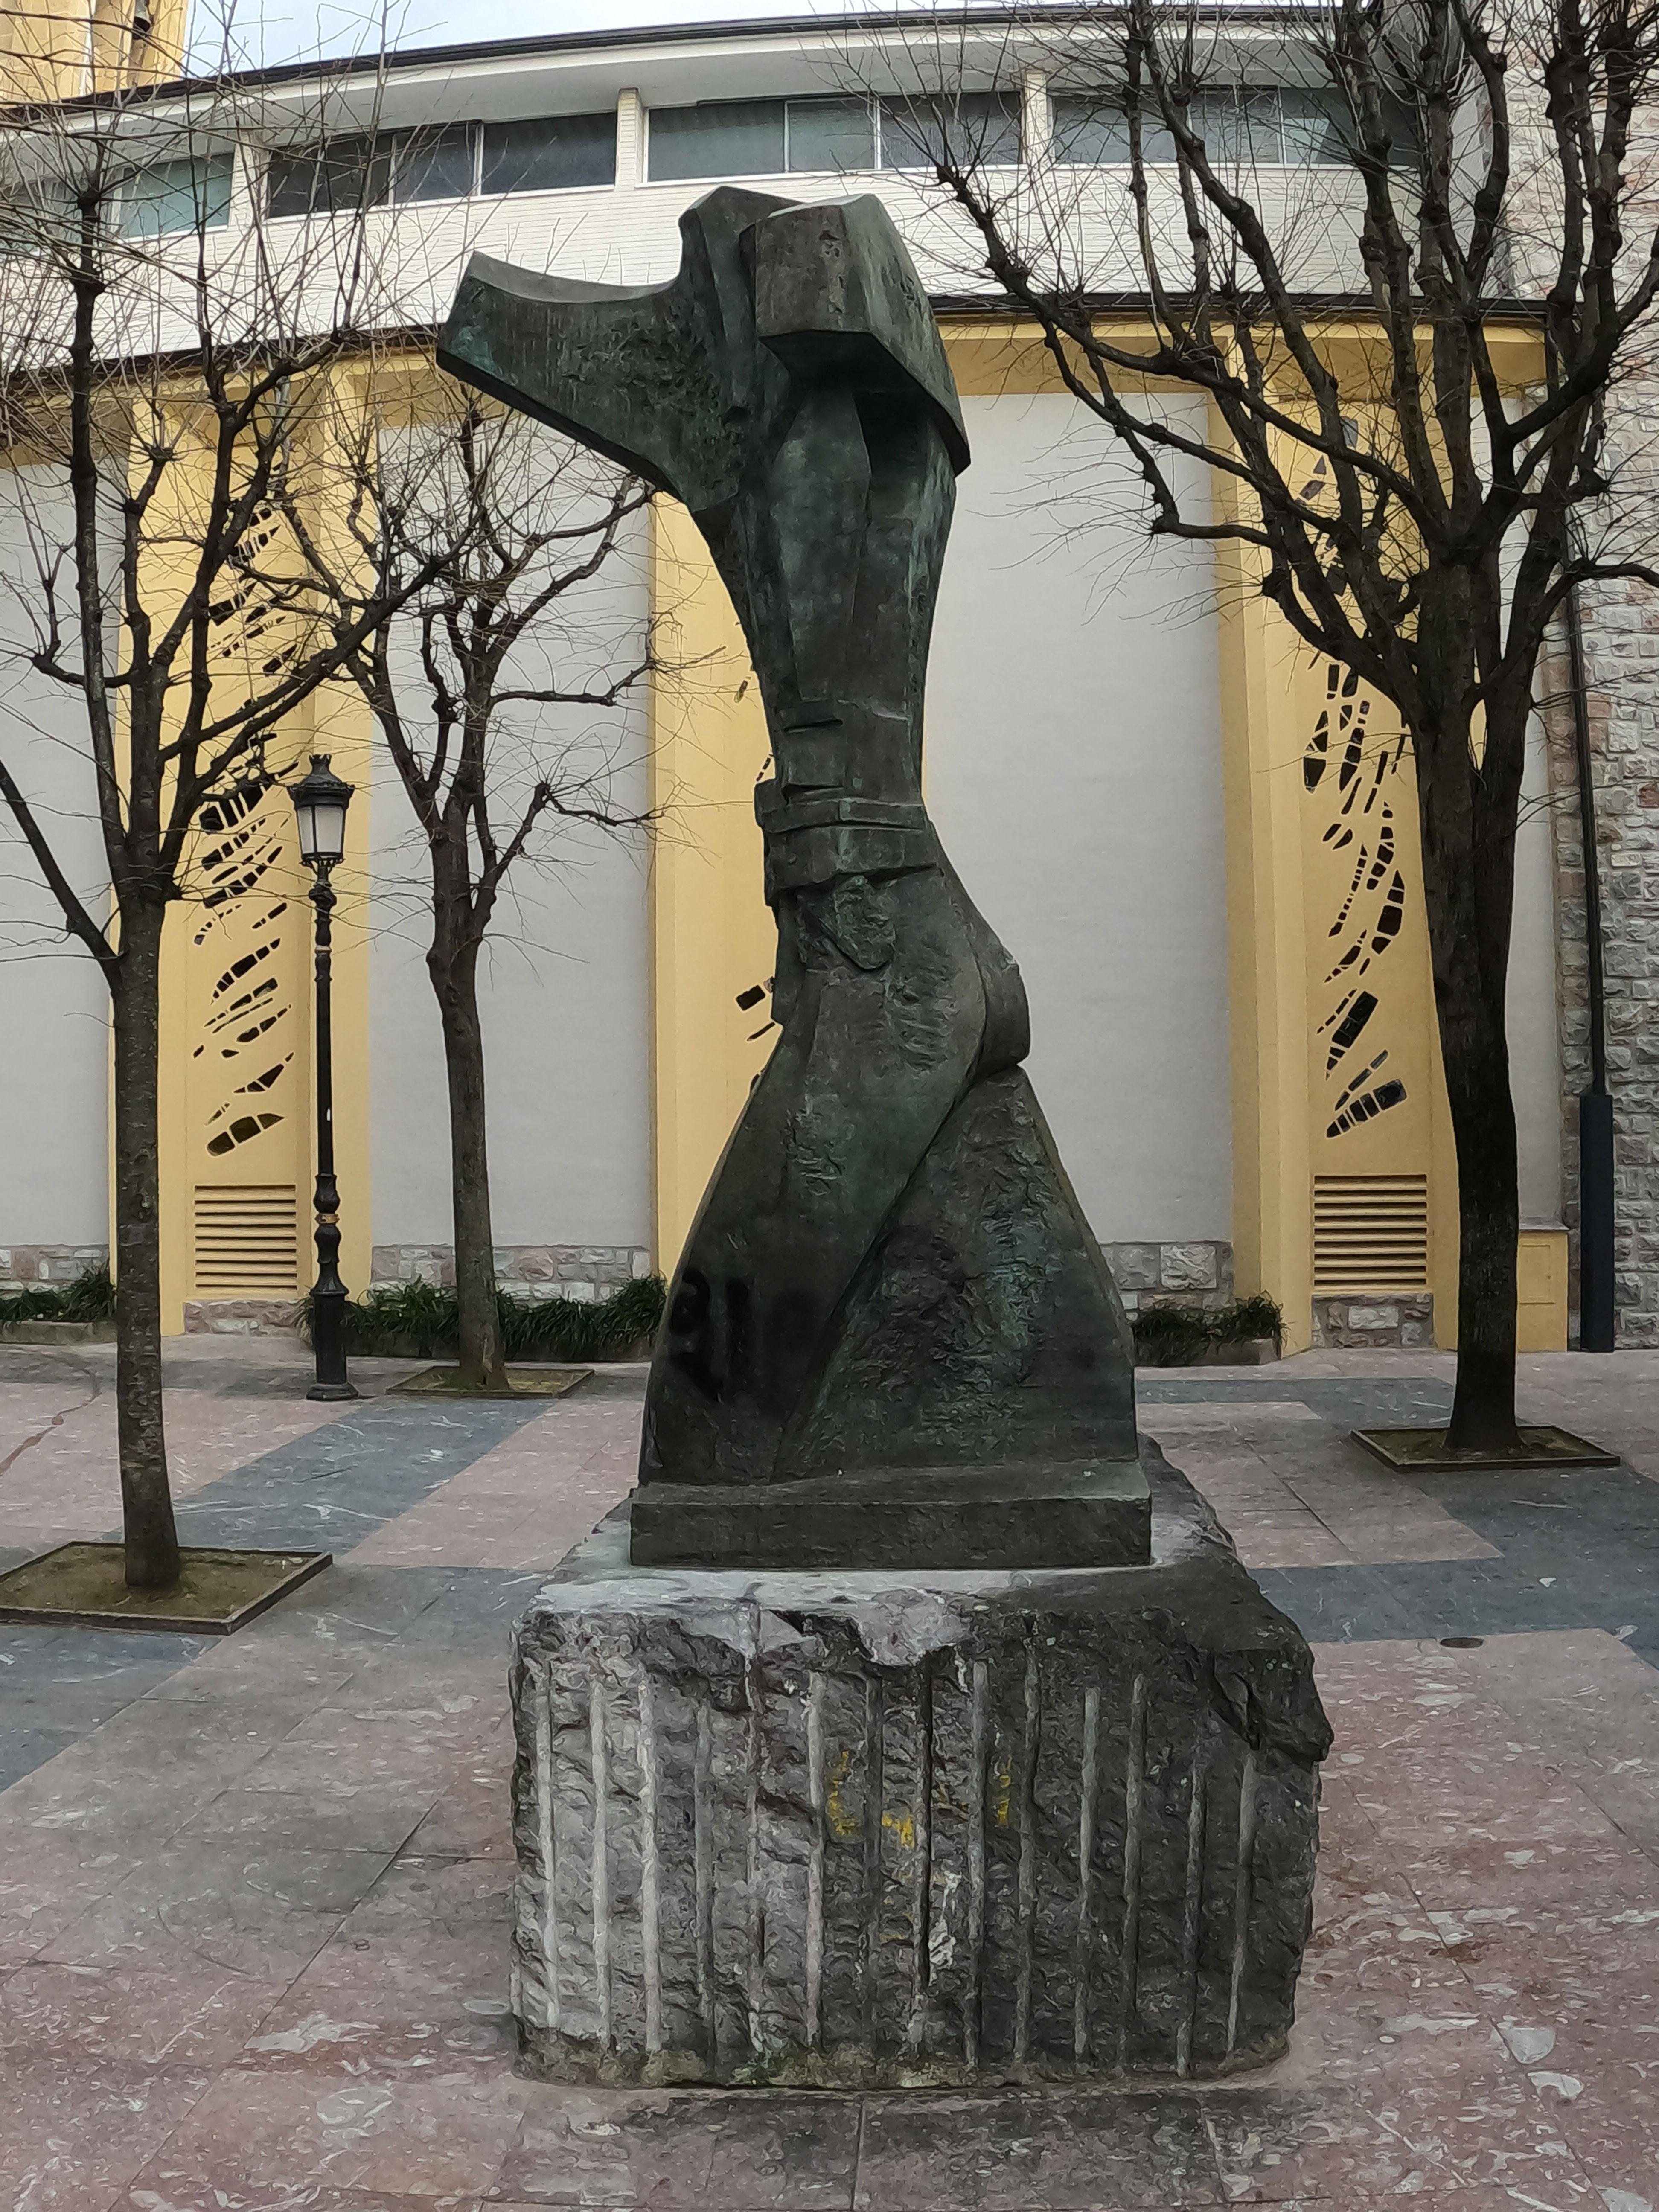 Escultura de José Alberdi Elorza - Homenaje al pelotari vasco